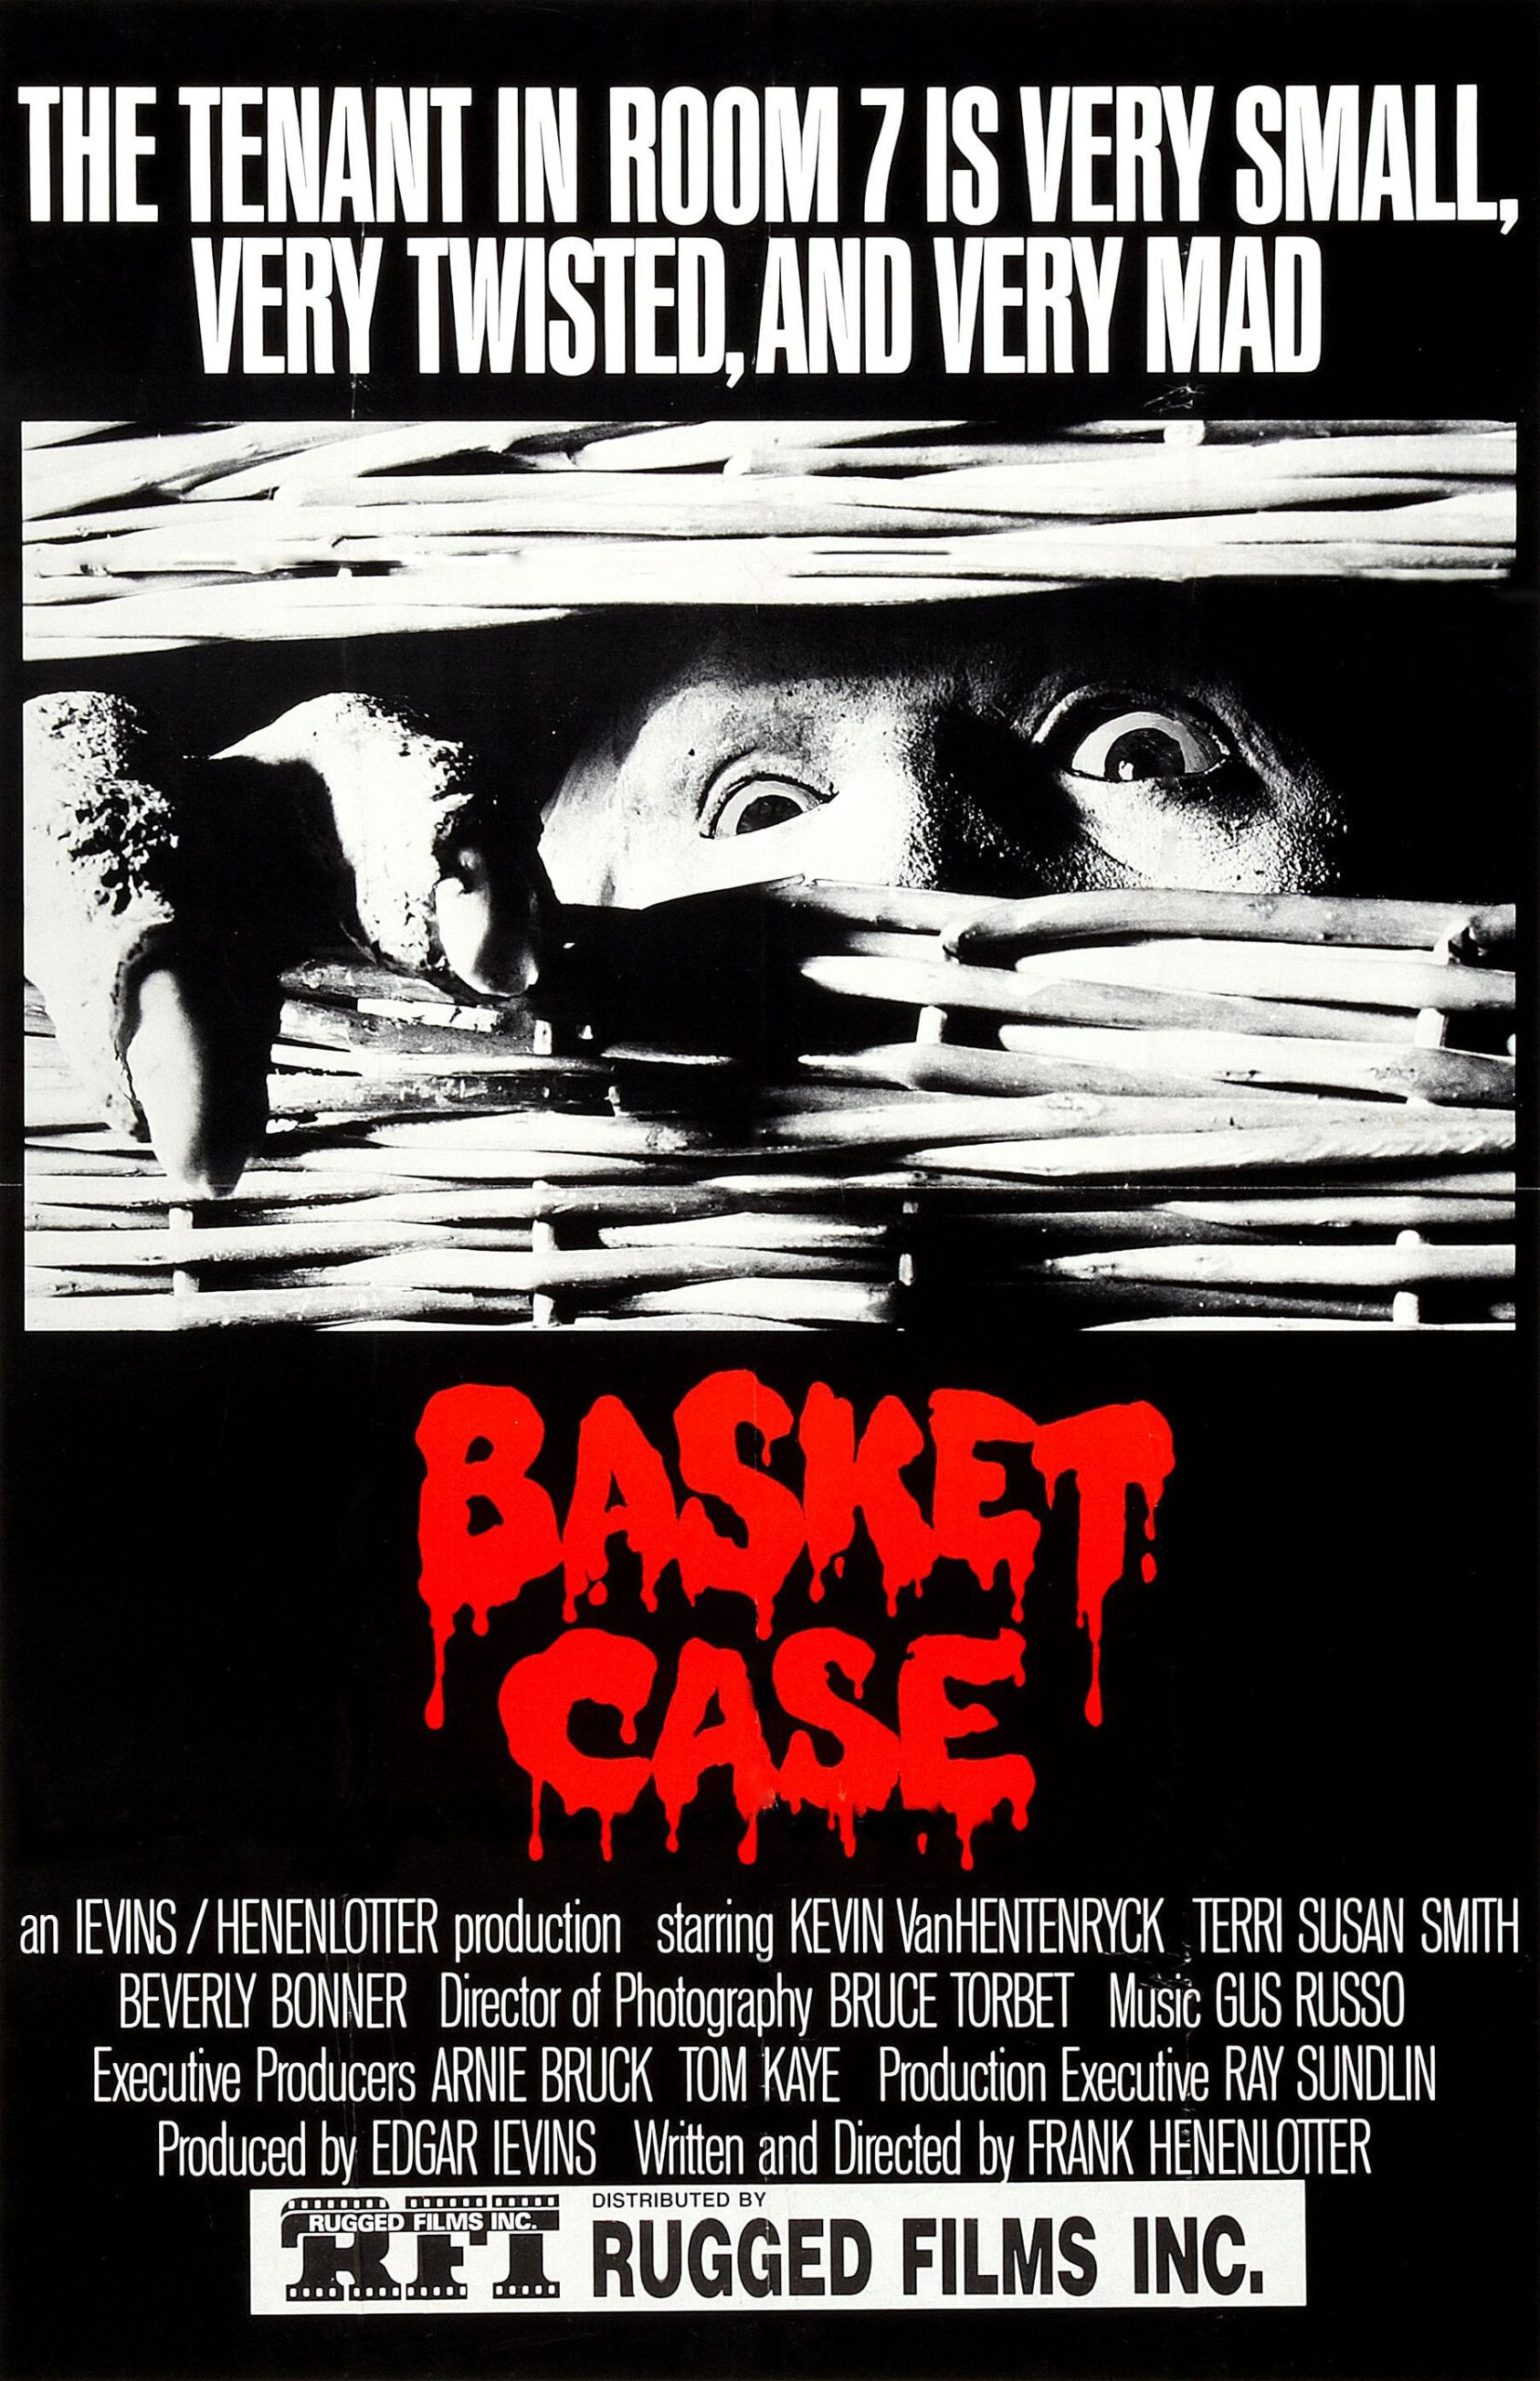 Club Imagine & Straight To Video: Basket Case